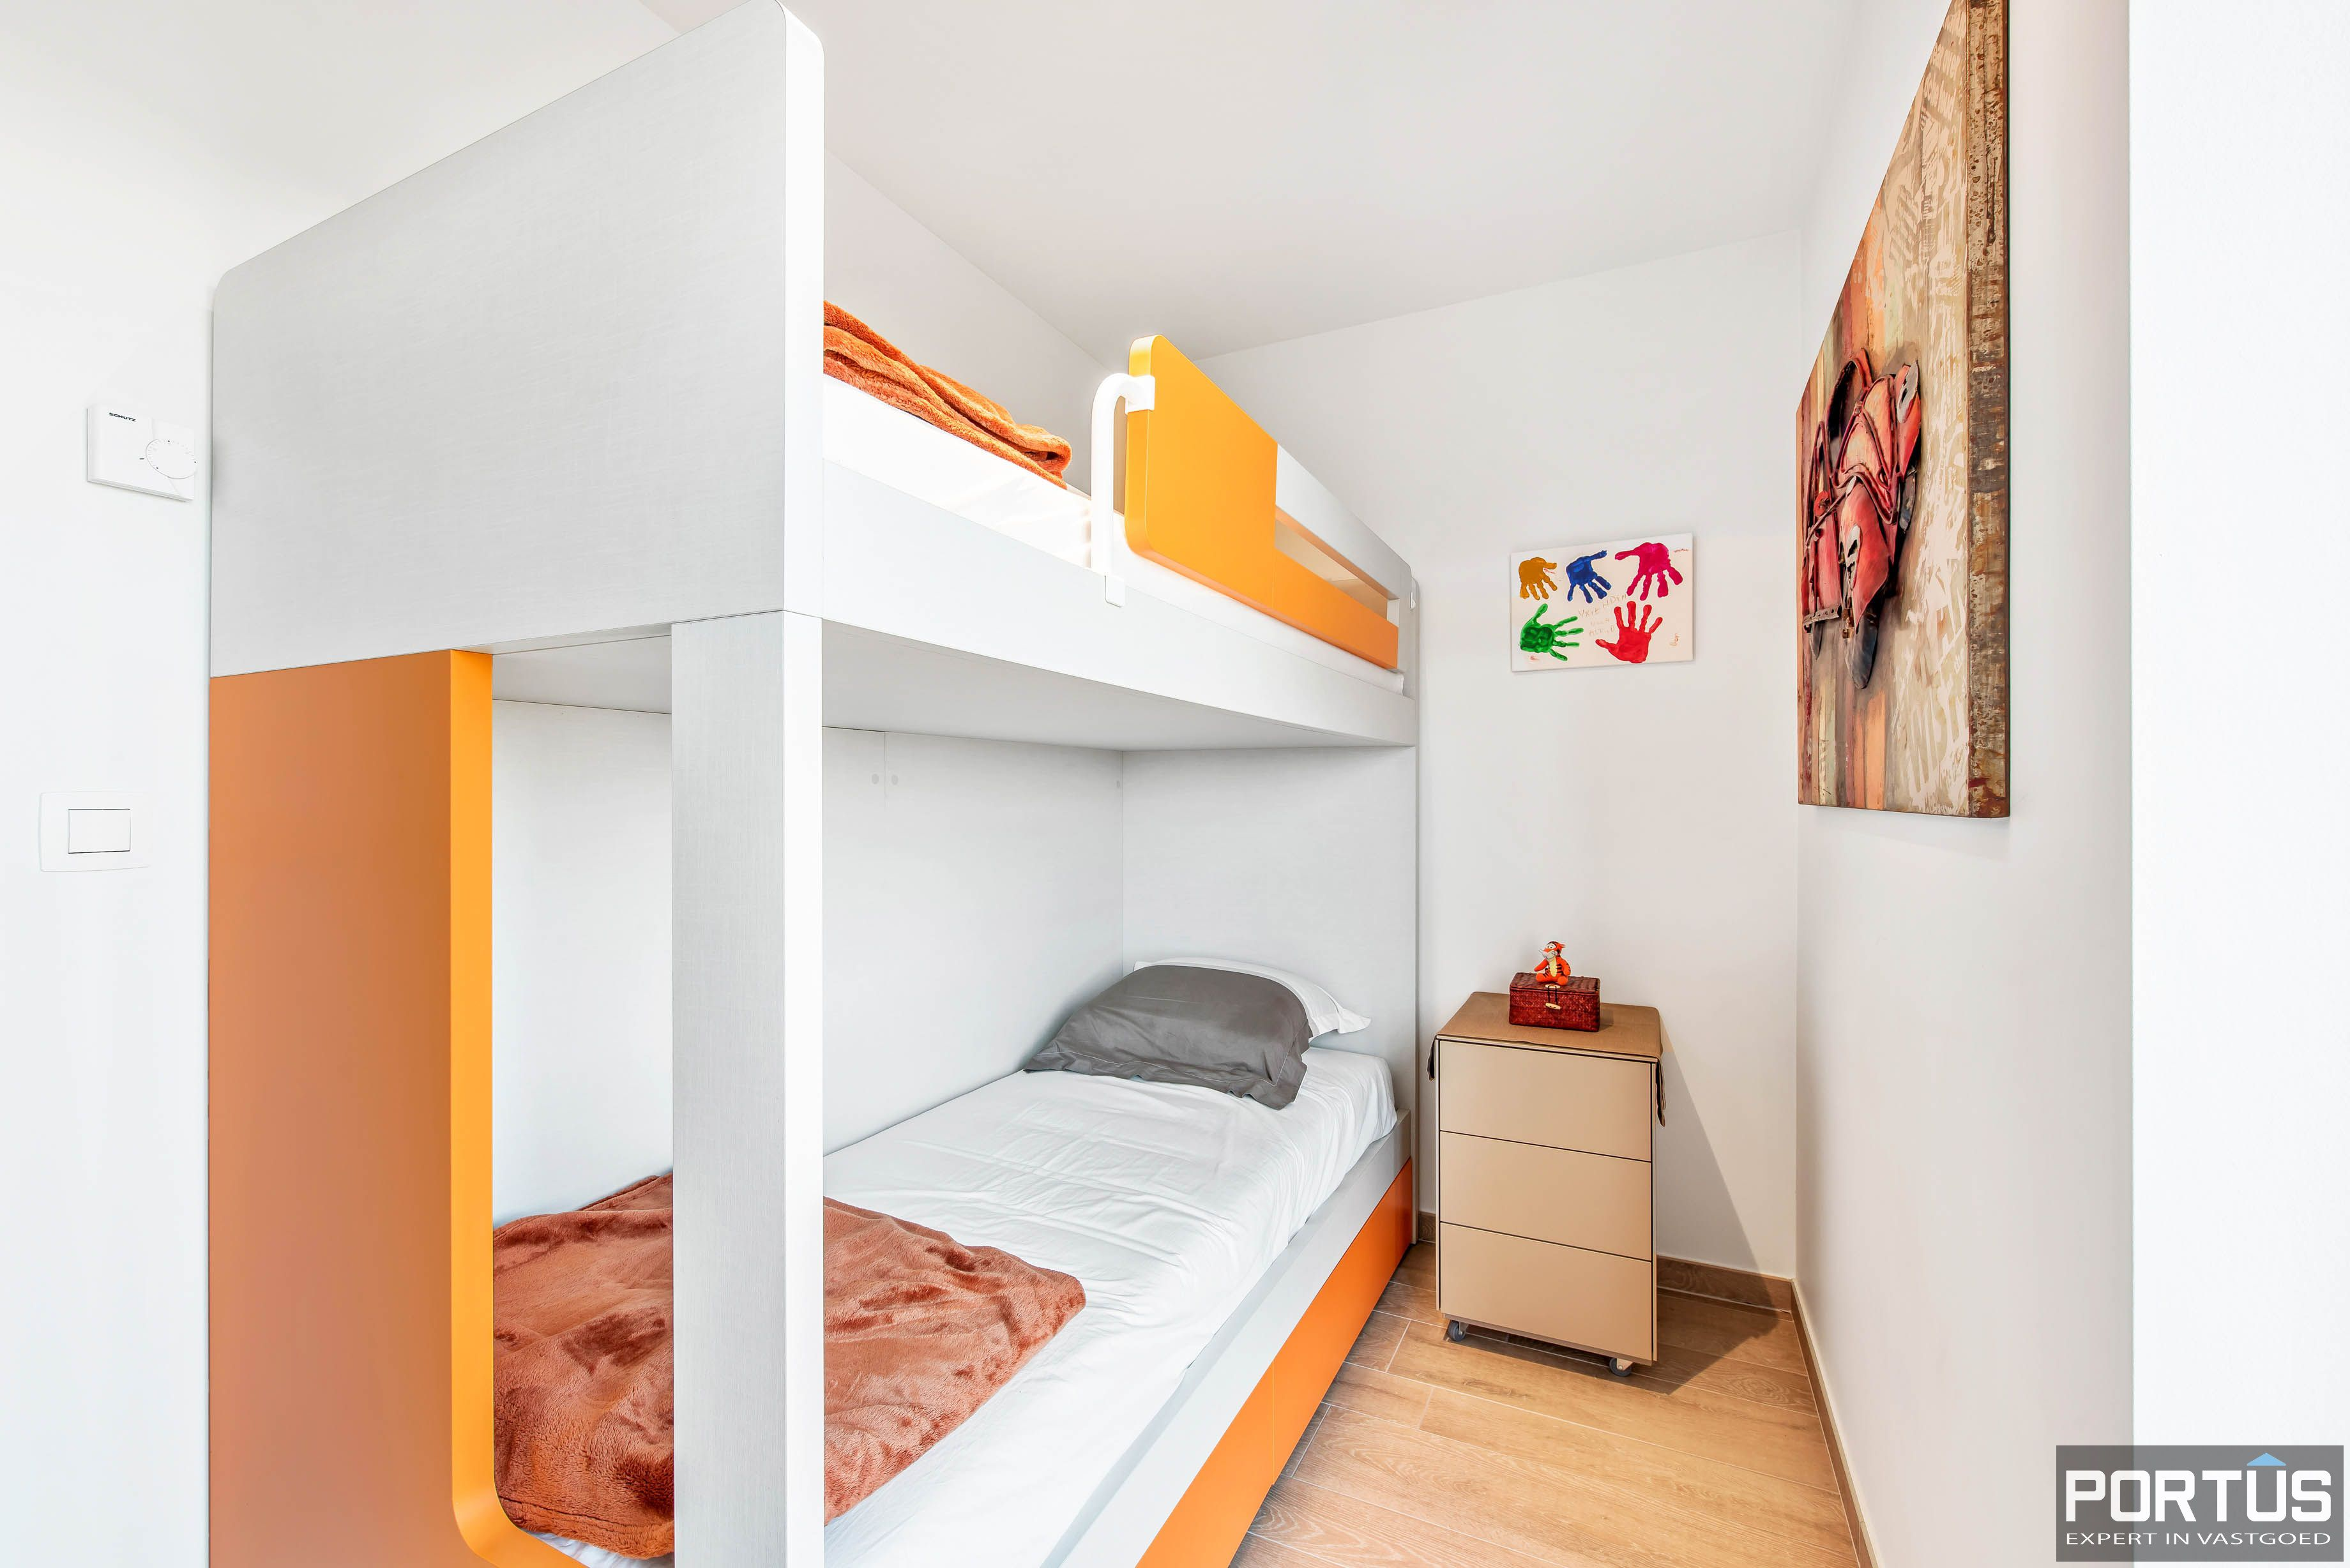 Exclusieve penthouse met 3 slaapkamers te koop te Nieuwpoort - 10925